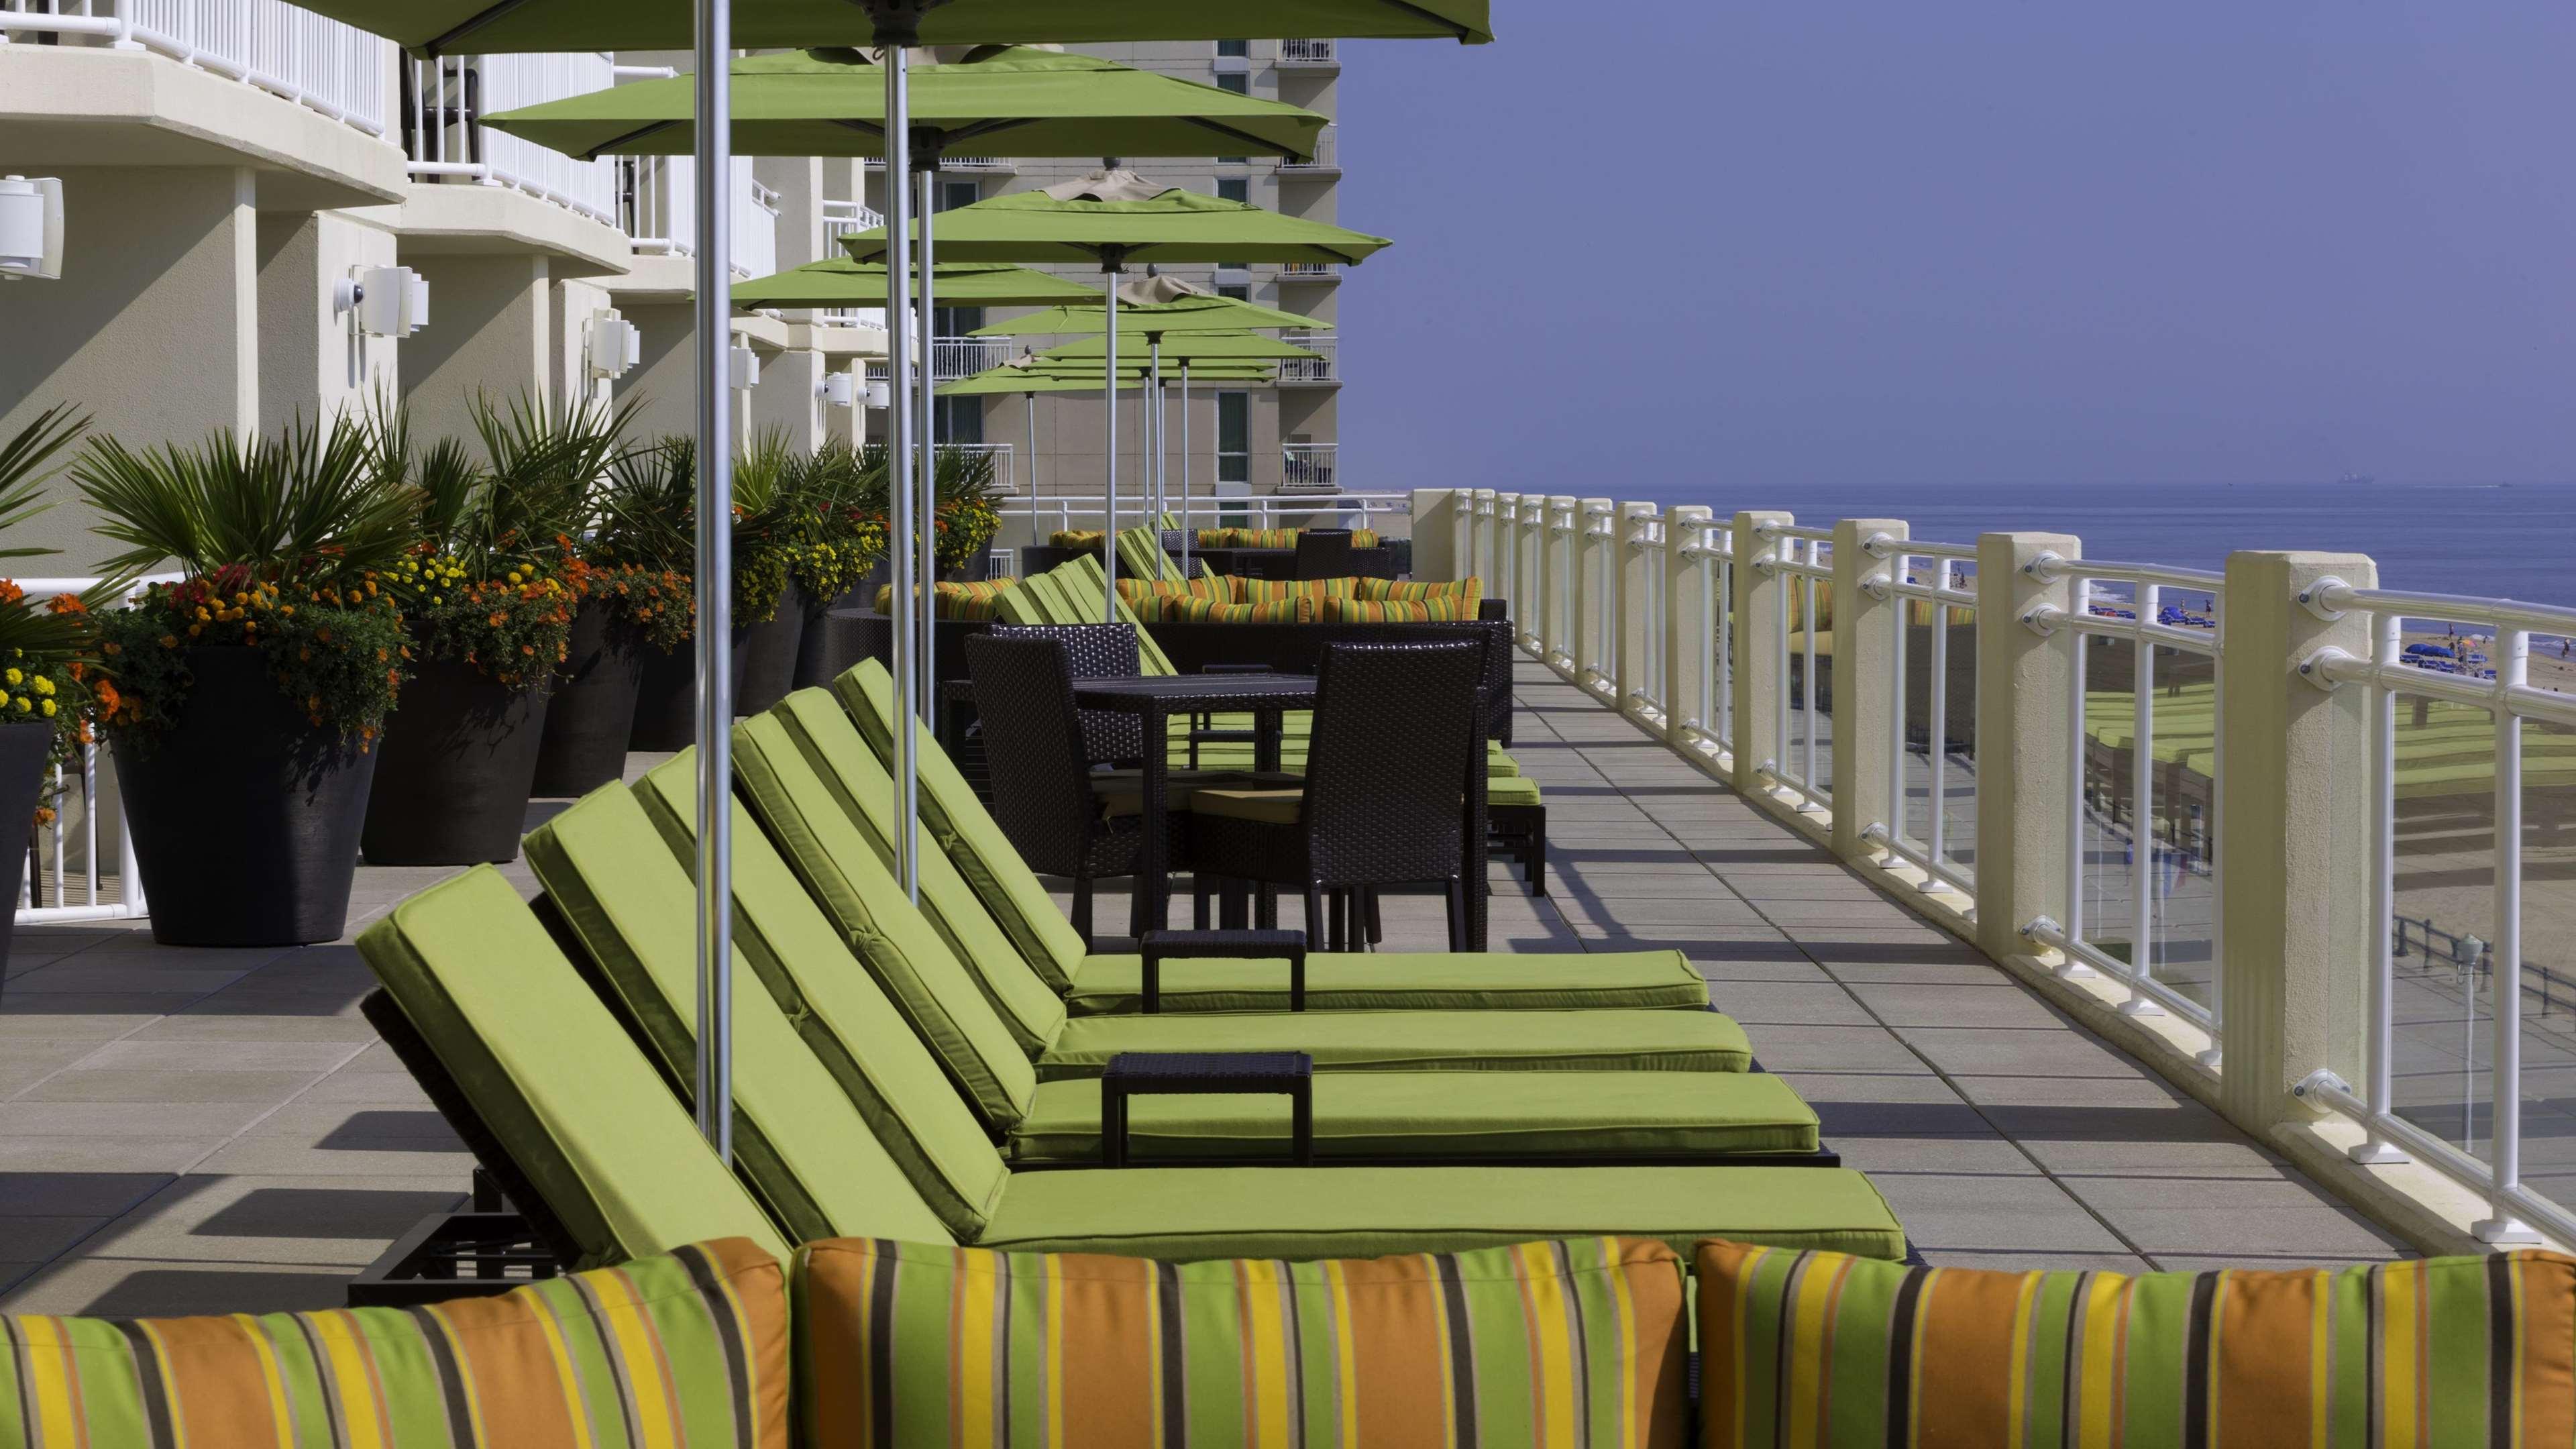 Hilton Garden Inn Virginia Beach Oceanfront image 8